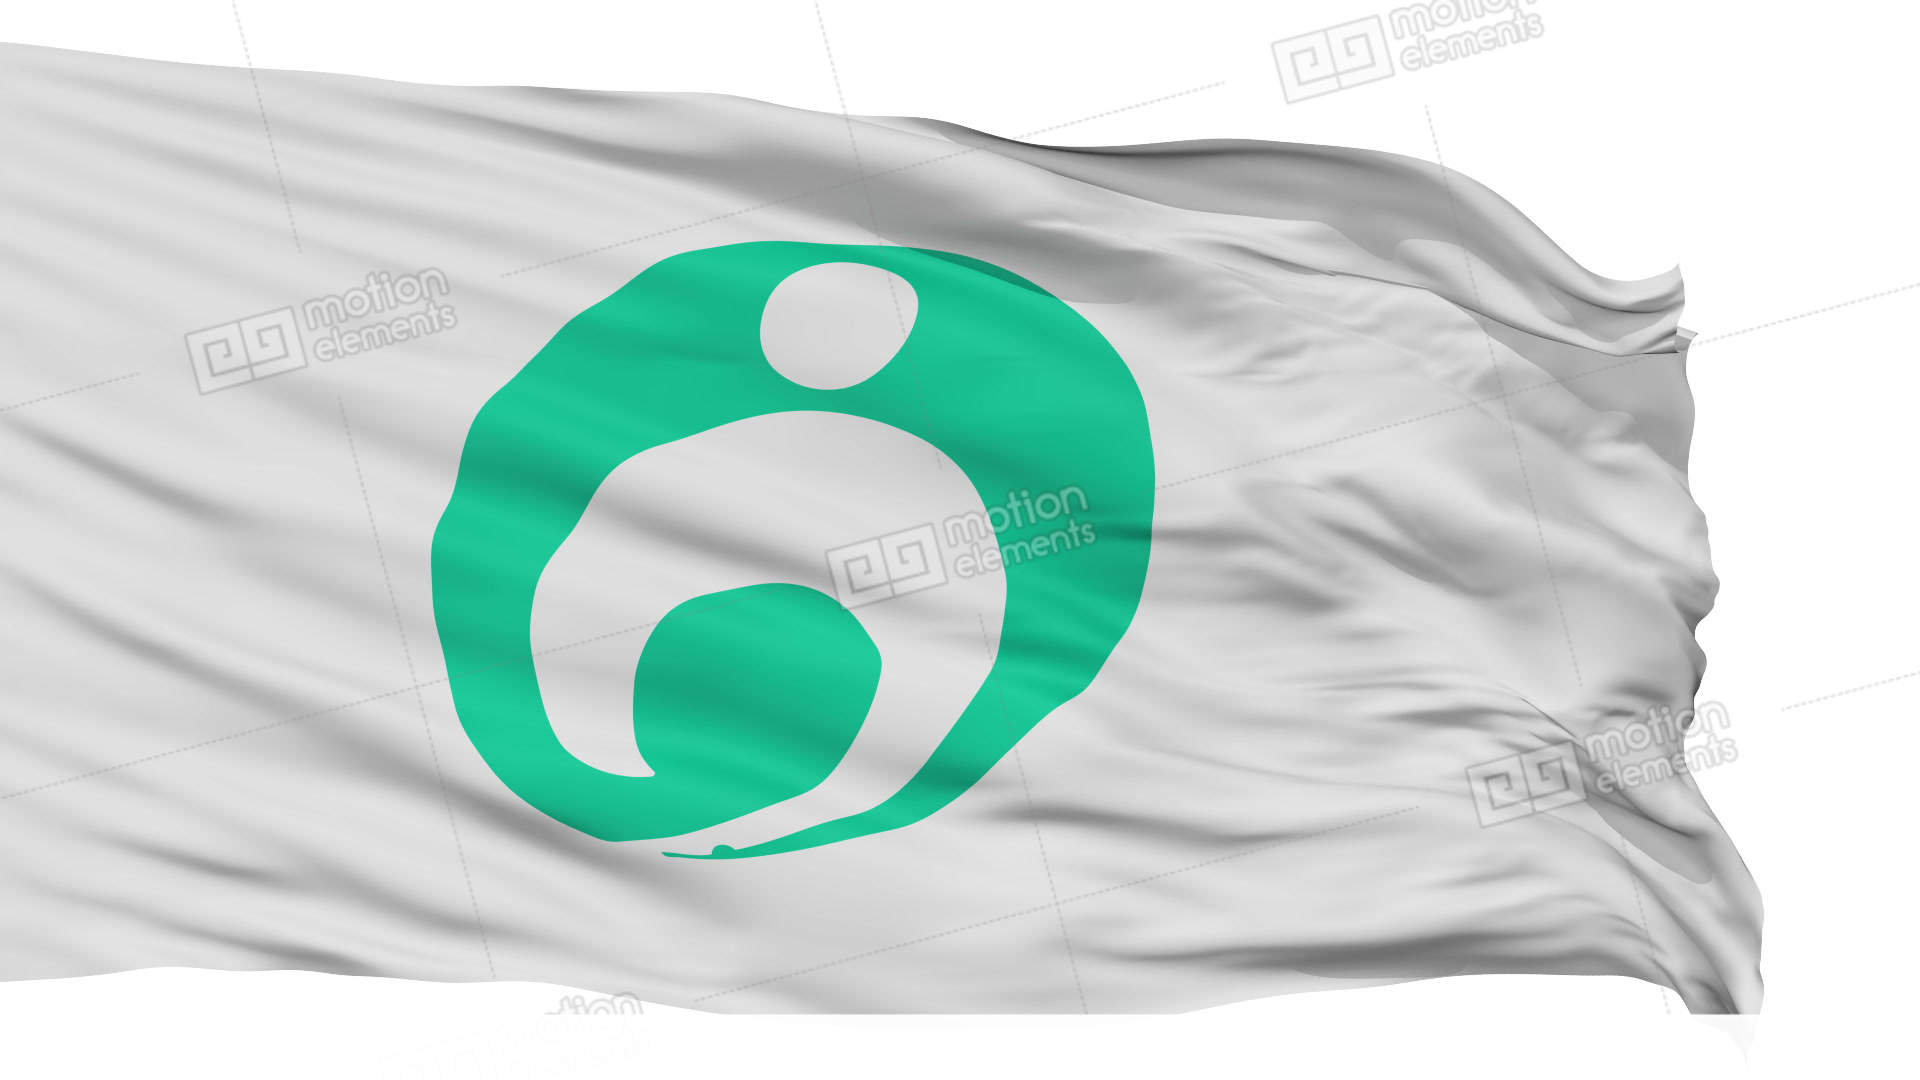 me11670164-isolated-usa-city-flag-prefecture-oita-japan-hd-a0240.jpg